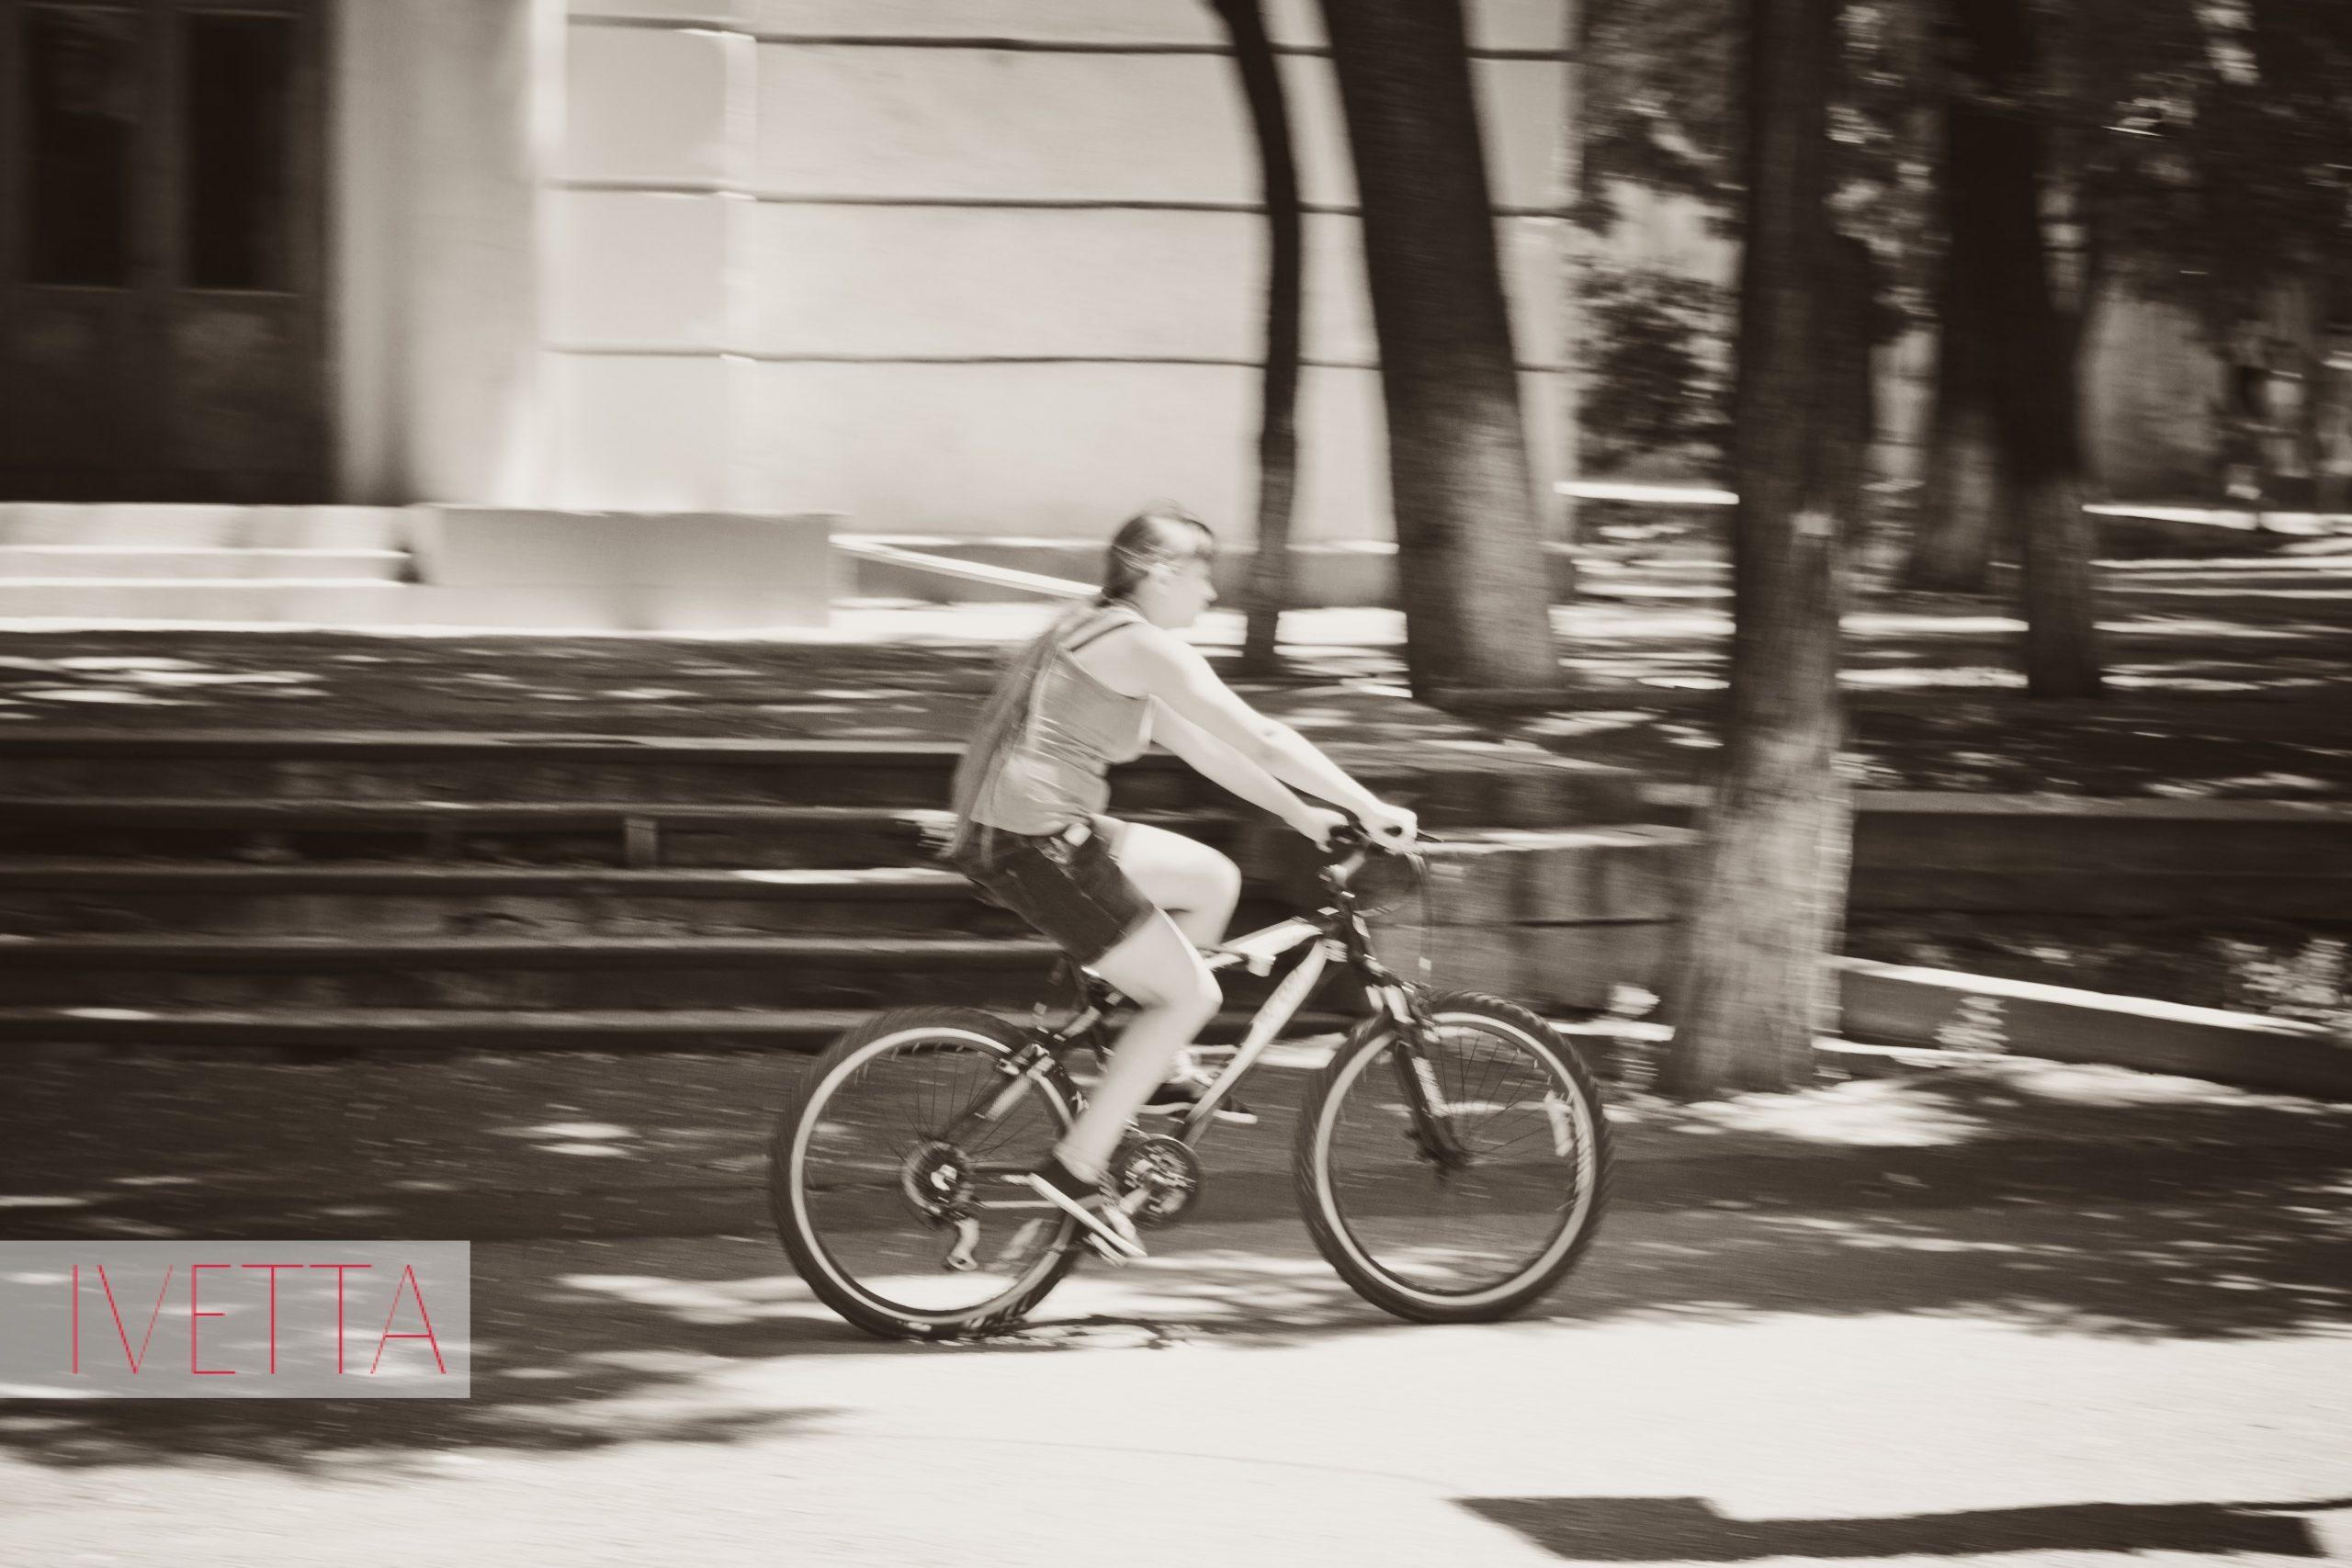 Девочка на велосипеде в Одессе